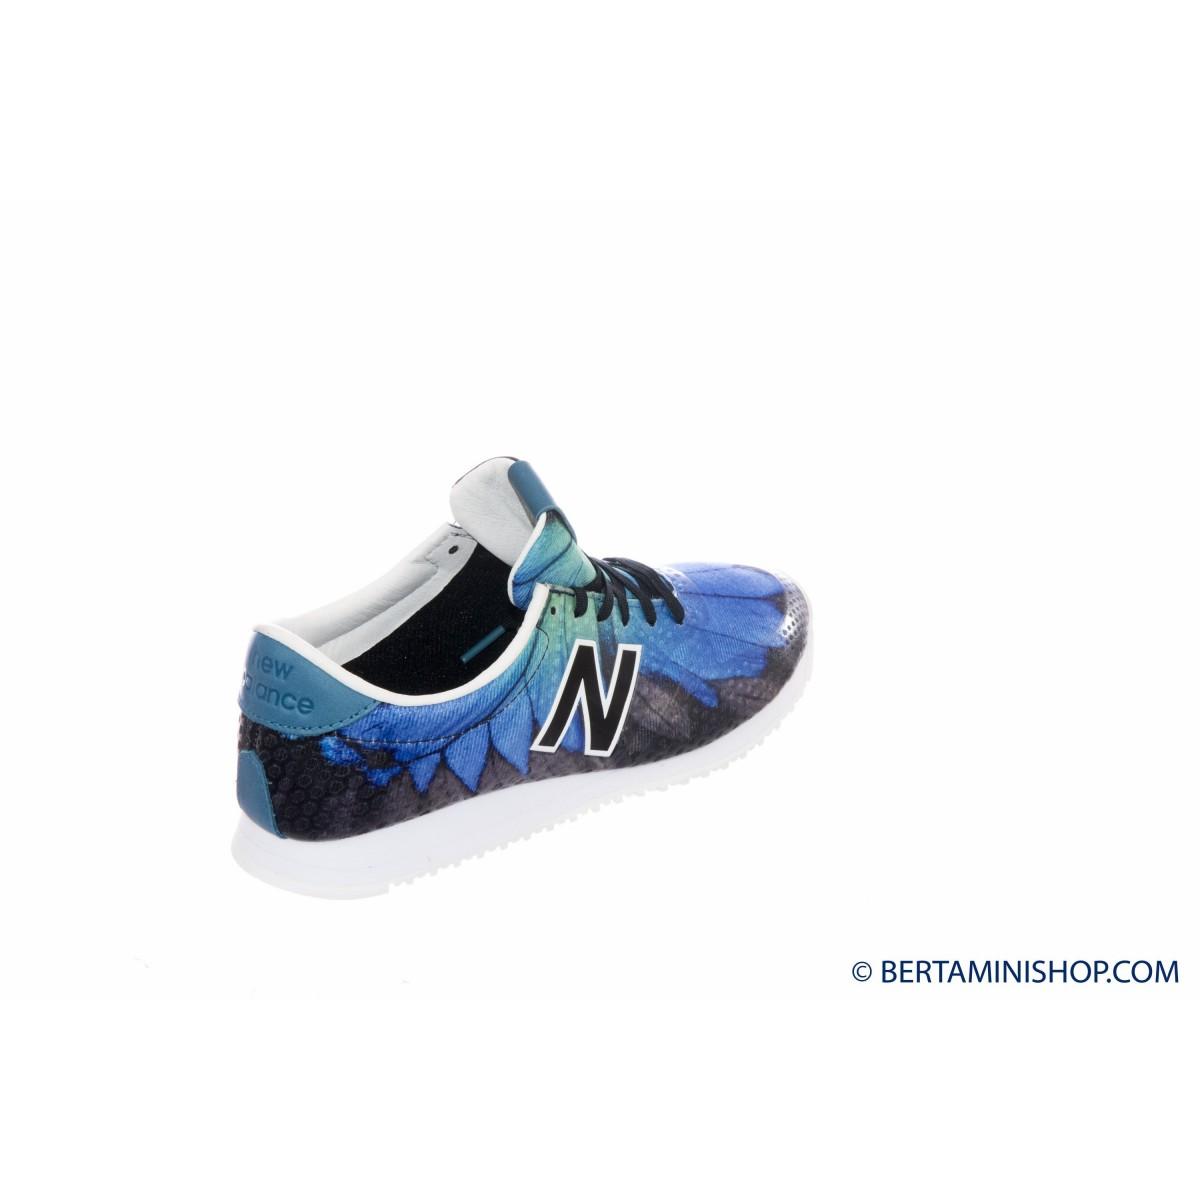 Scarpa New balance - Wl 420 running anni 70 stampa DFB - Nero bluette